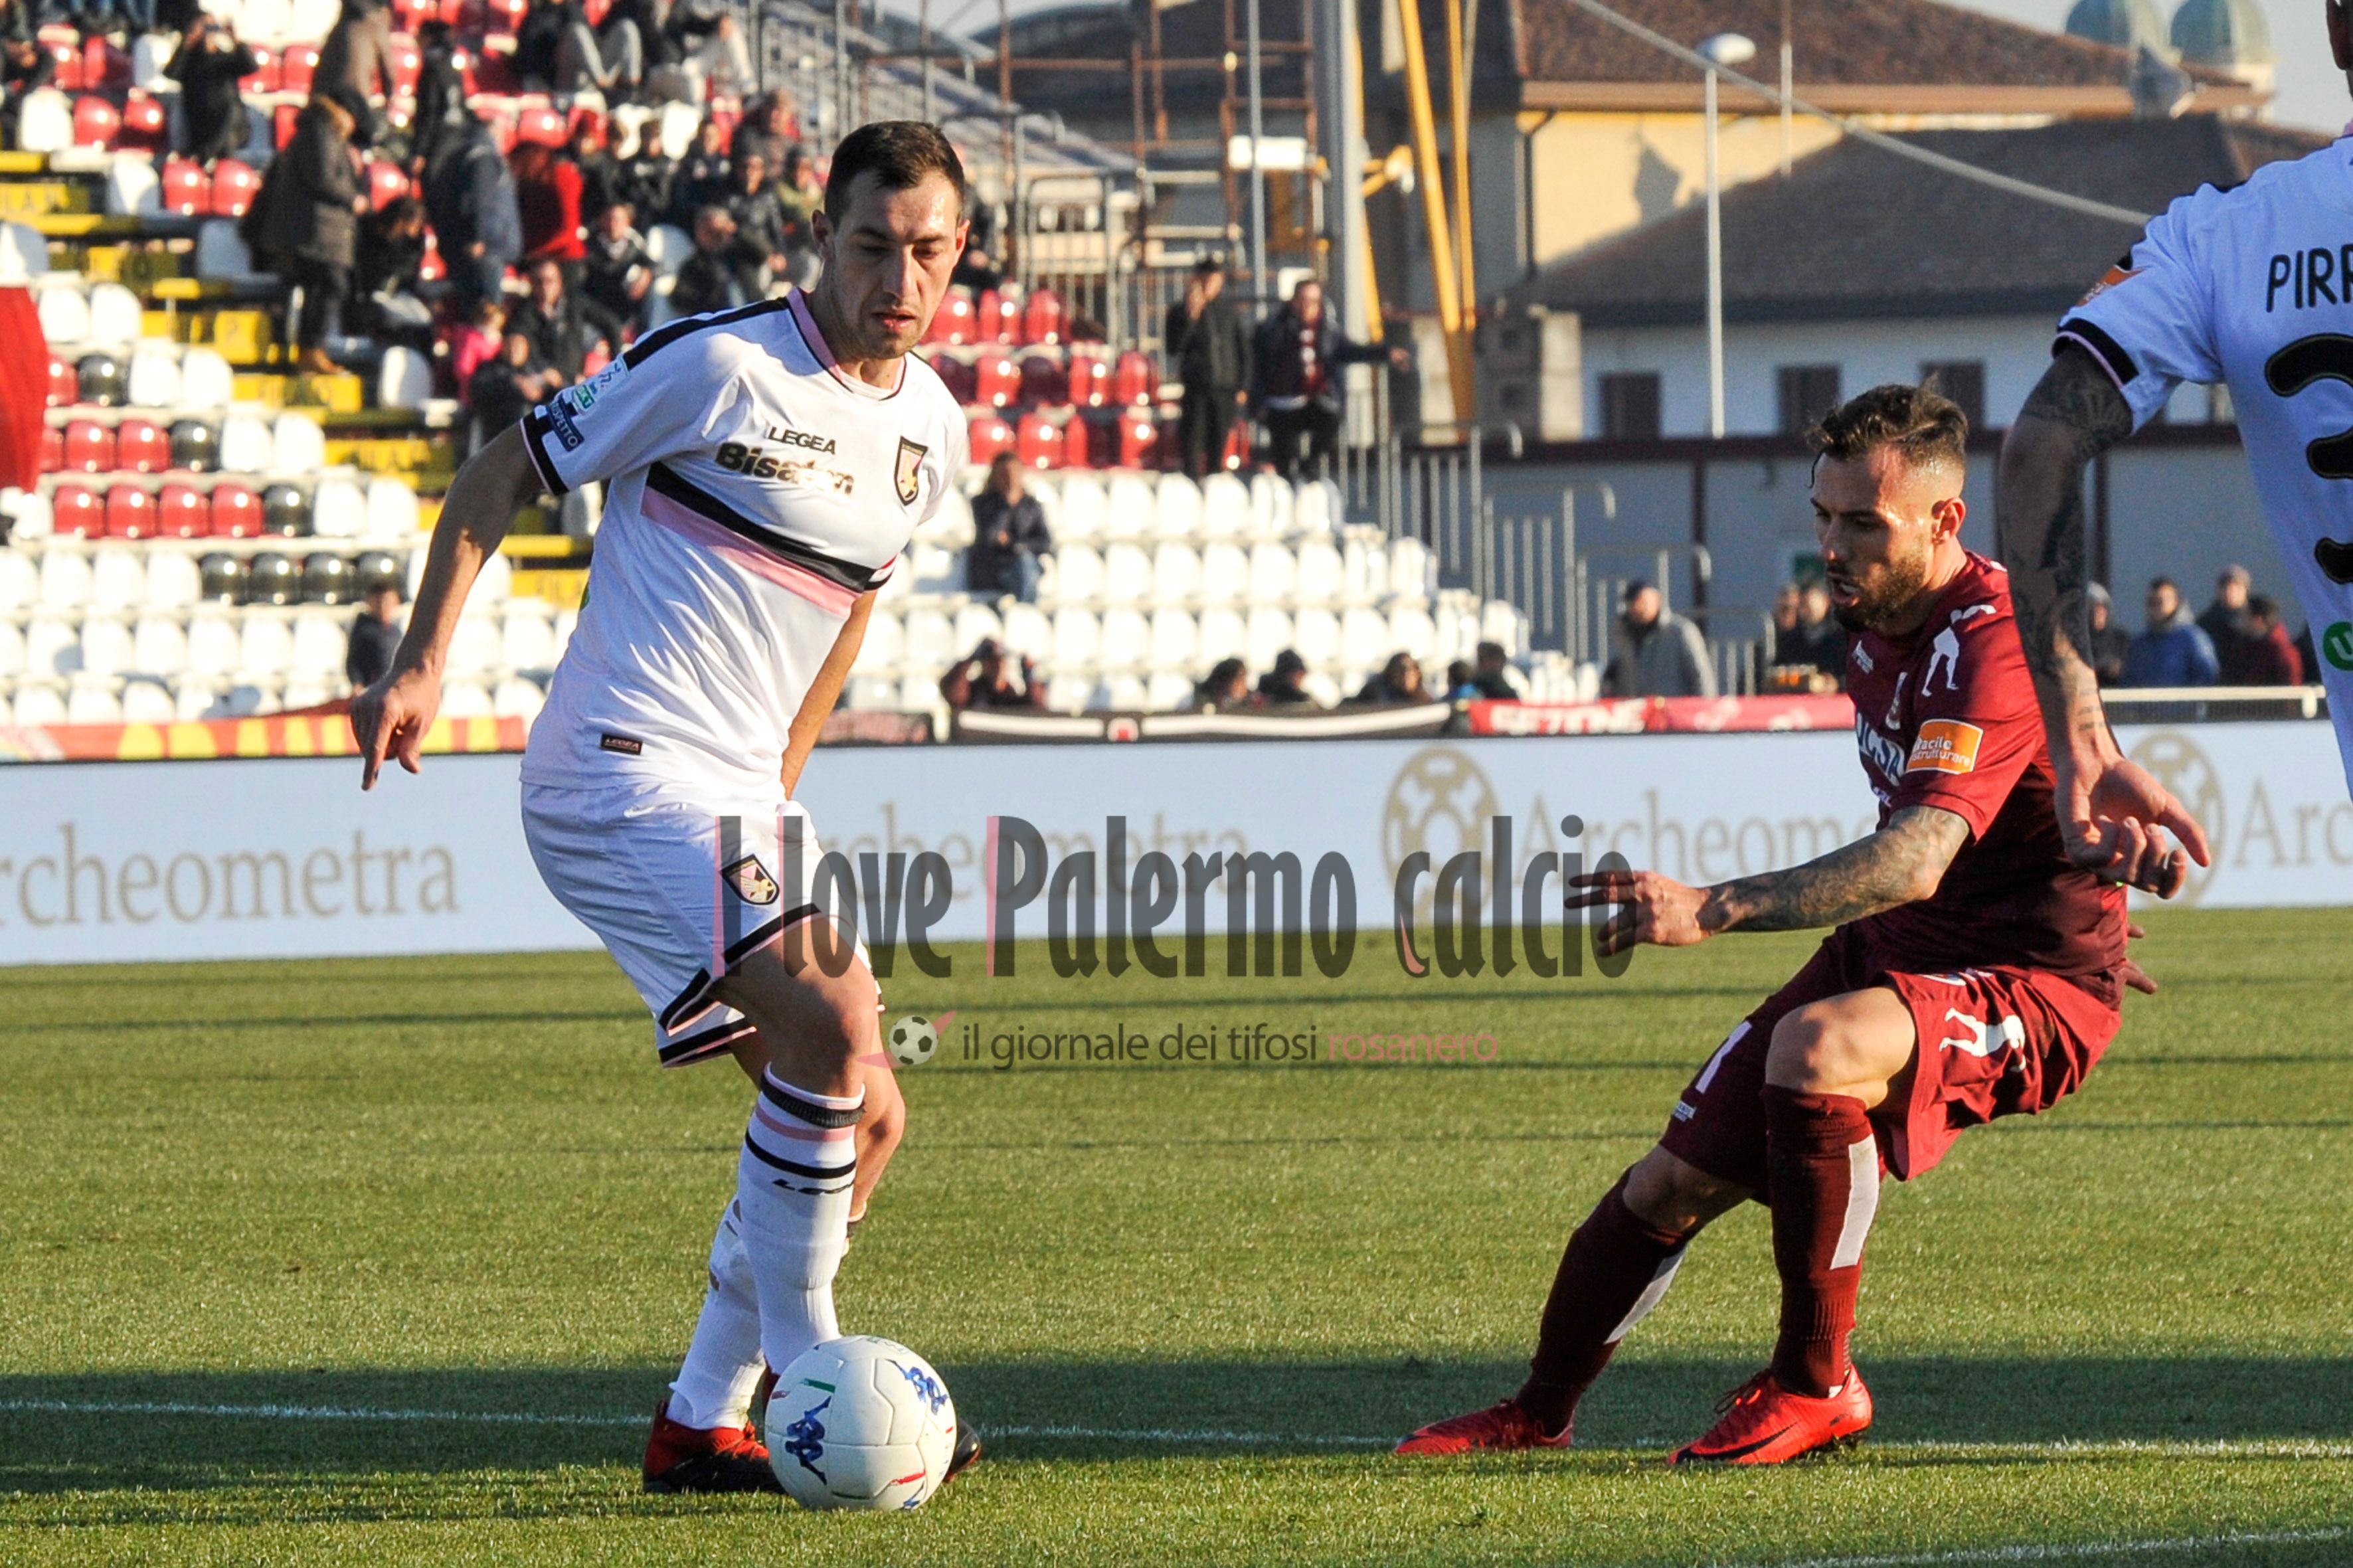 Cittadella vs Palermo jajalo